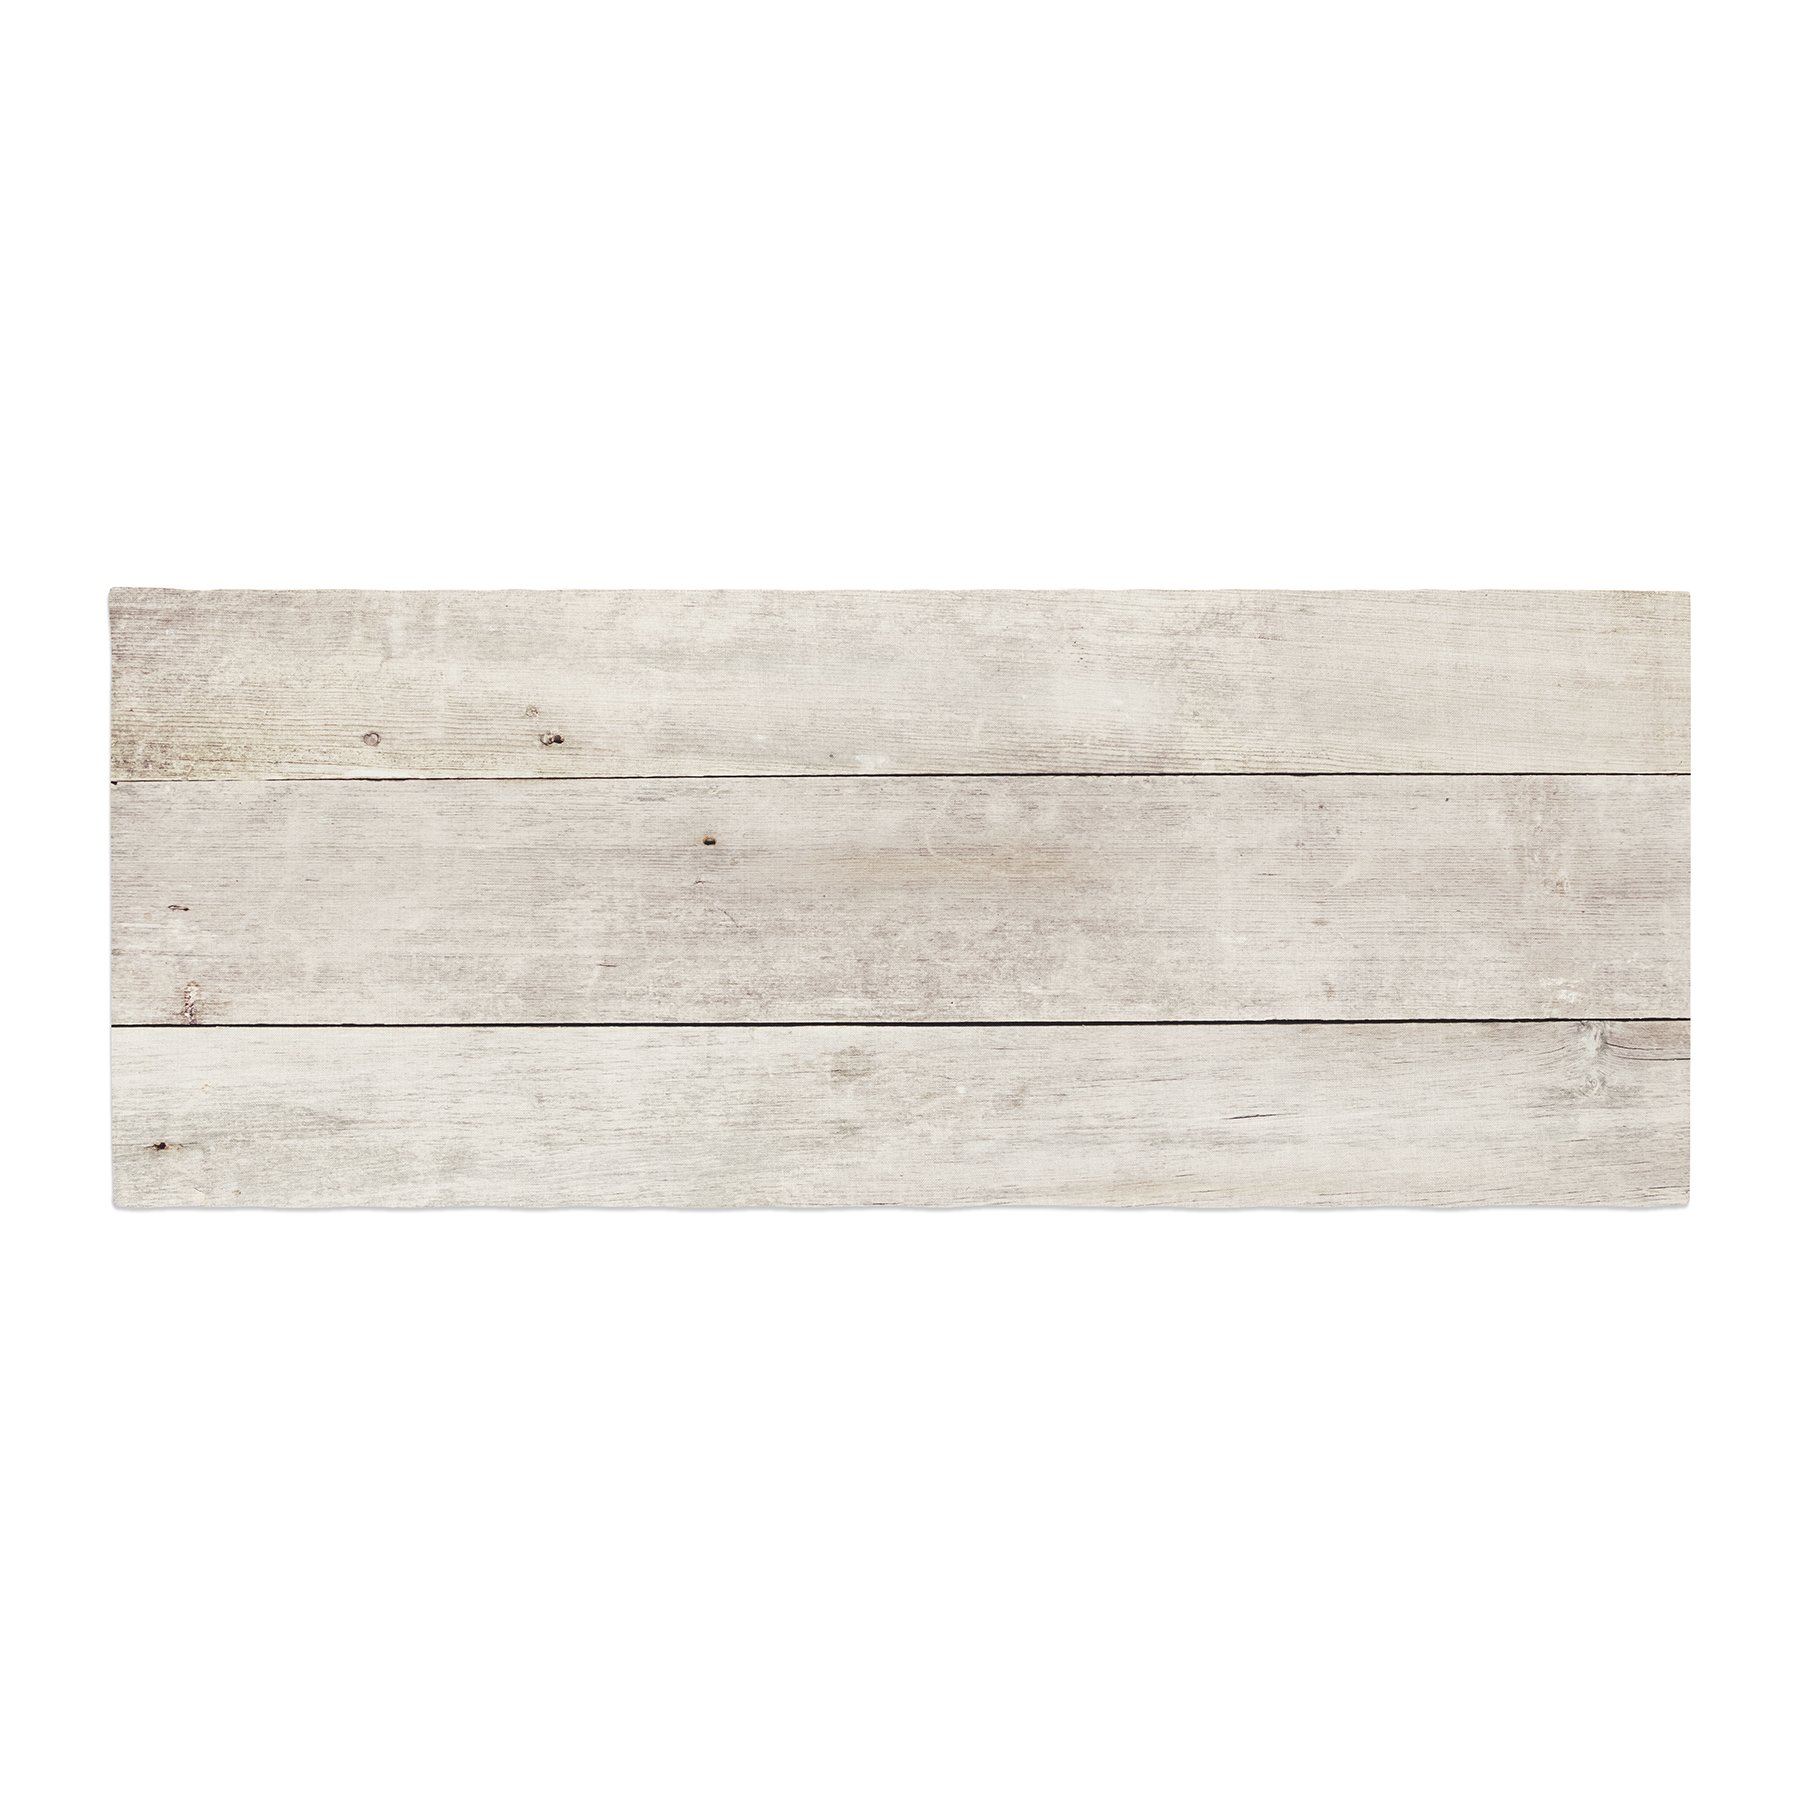 Kess InHouse Susan Sanders White Wash Wood Beige White Bed Runner, 34'' x 86''